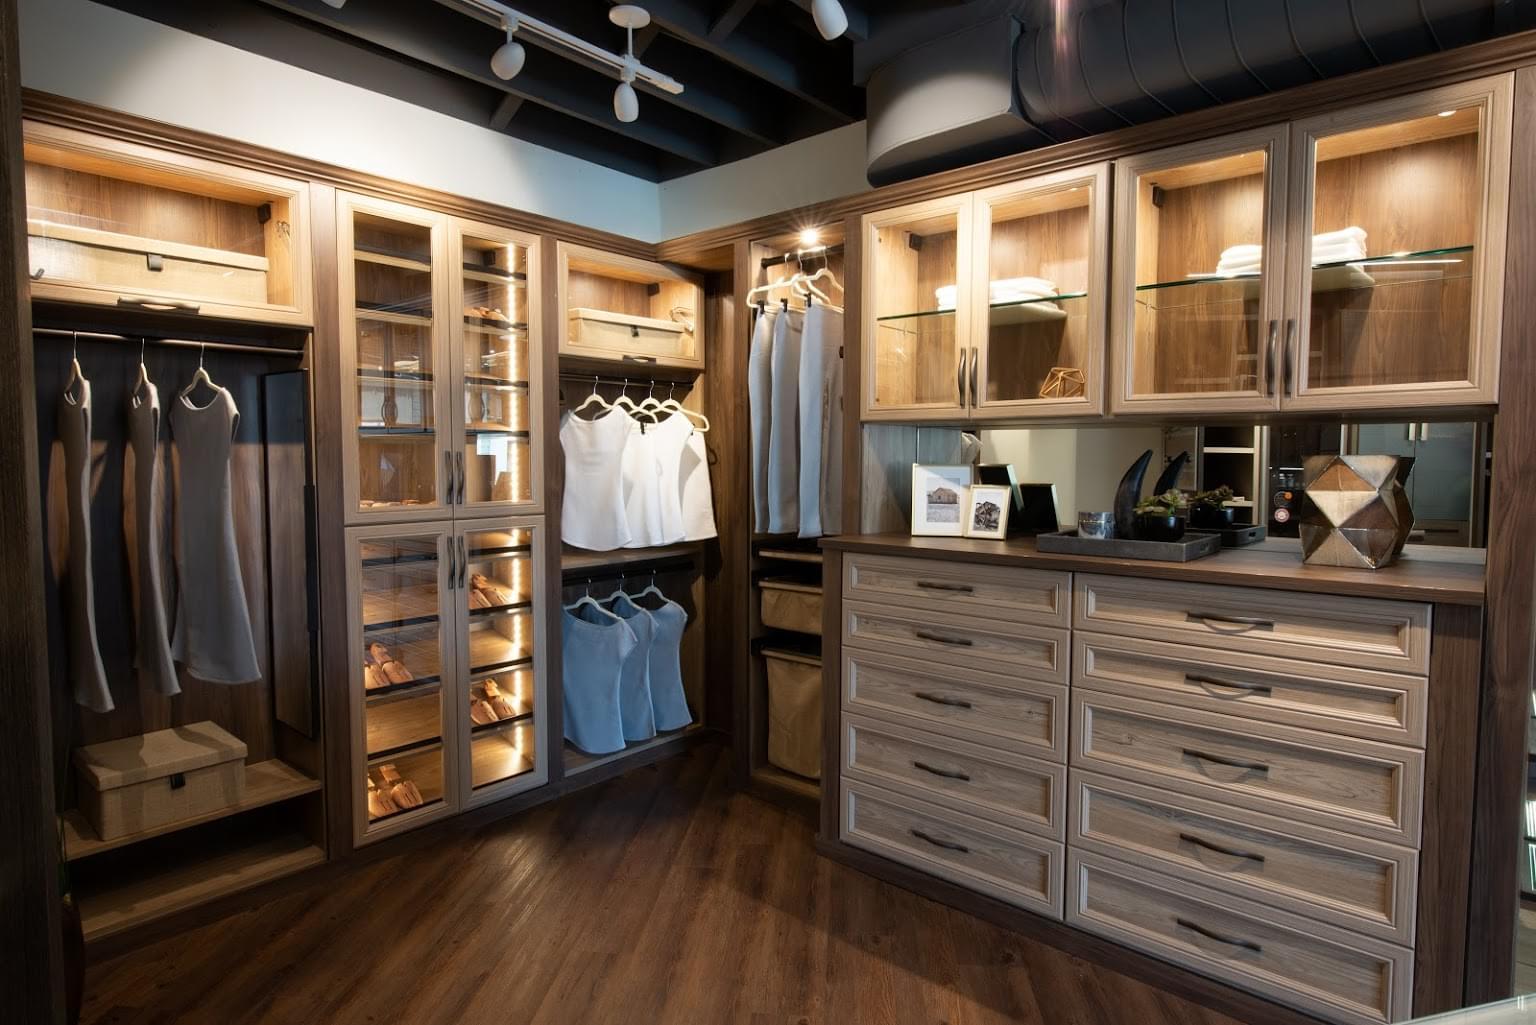 California Closets Interior designer in Corona del Mar, CA